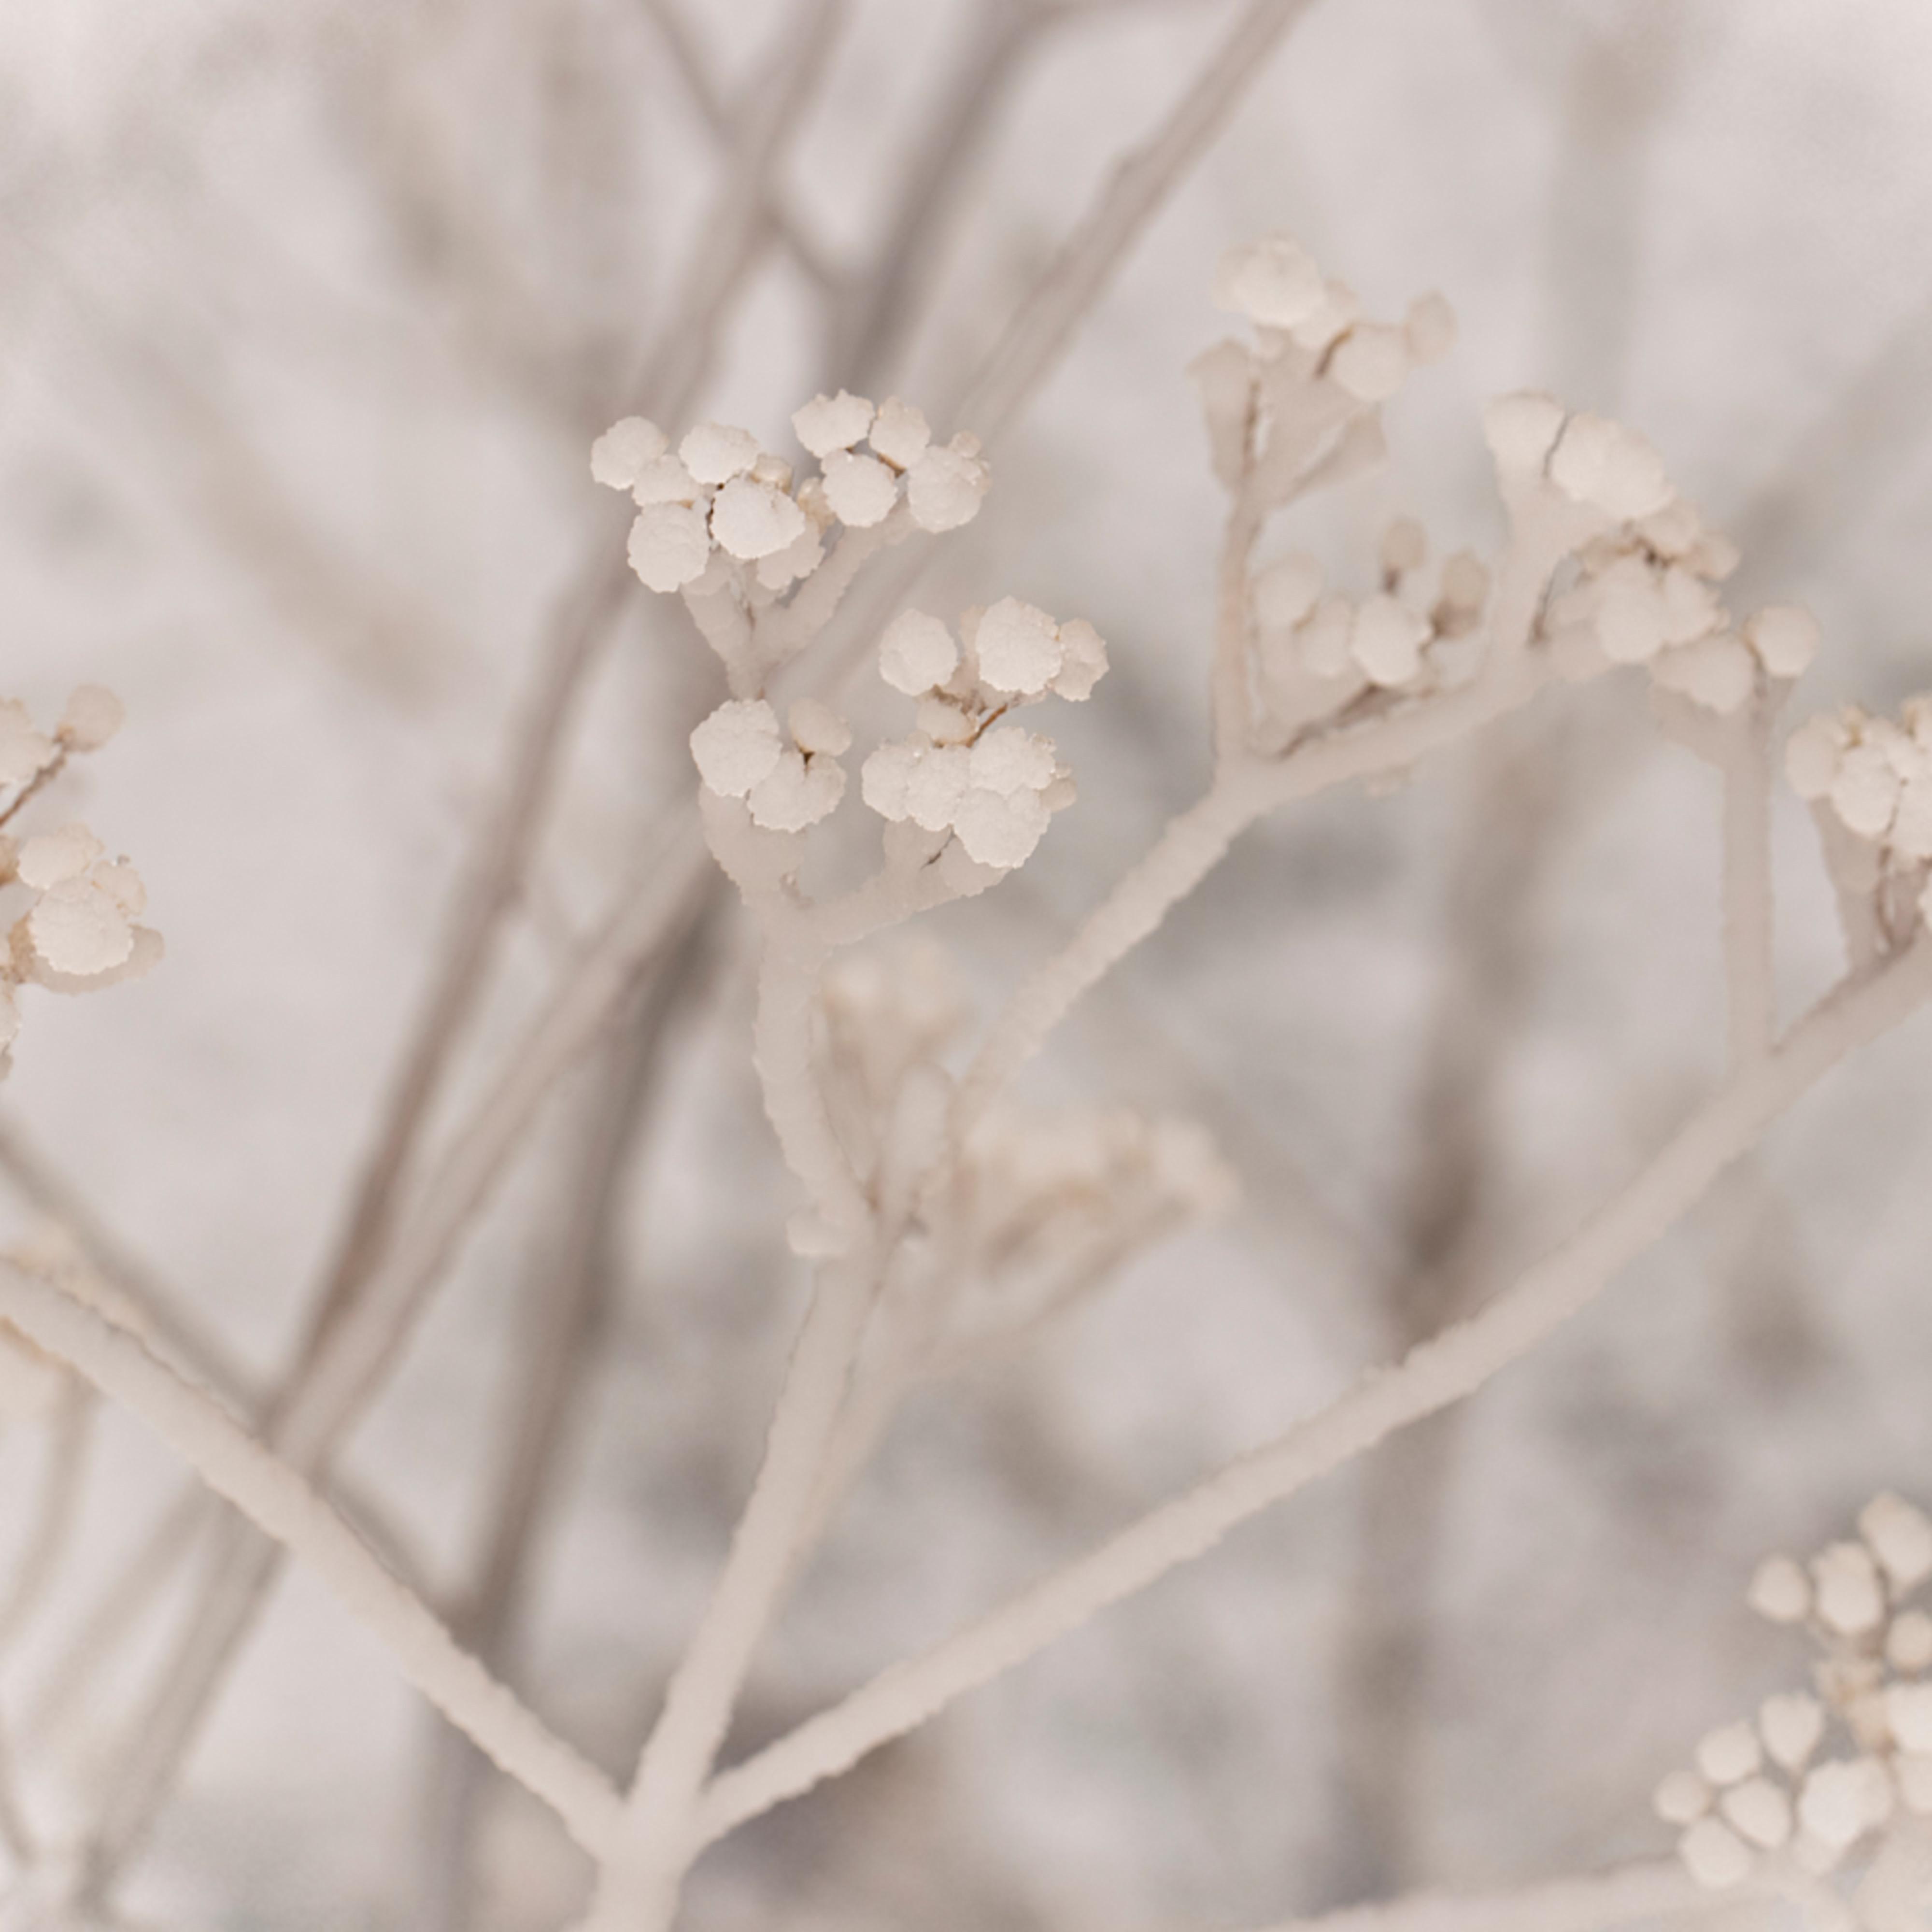 Ice on seed pods 1083 fss jvkp6w